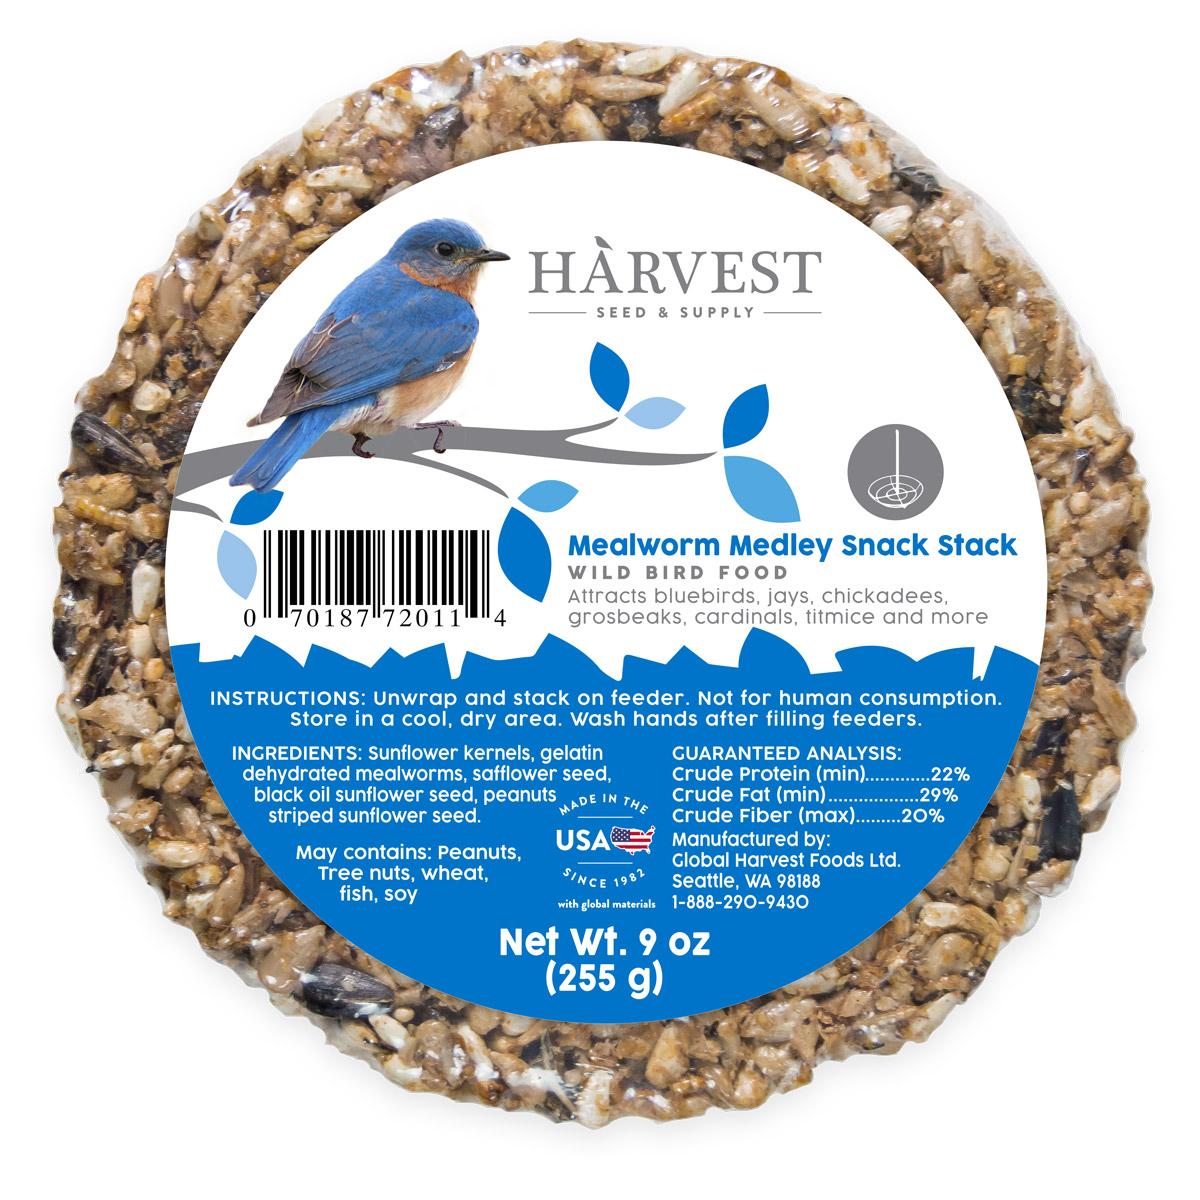 Mealworm Medley Snack Stack Image